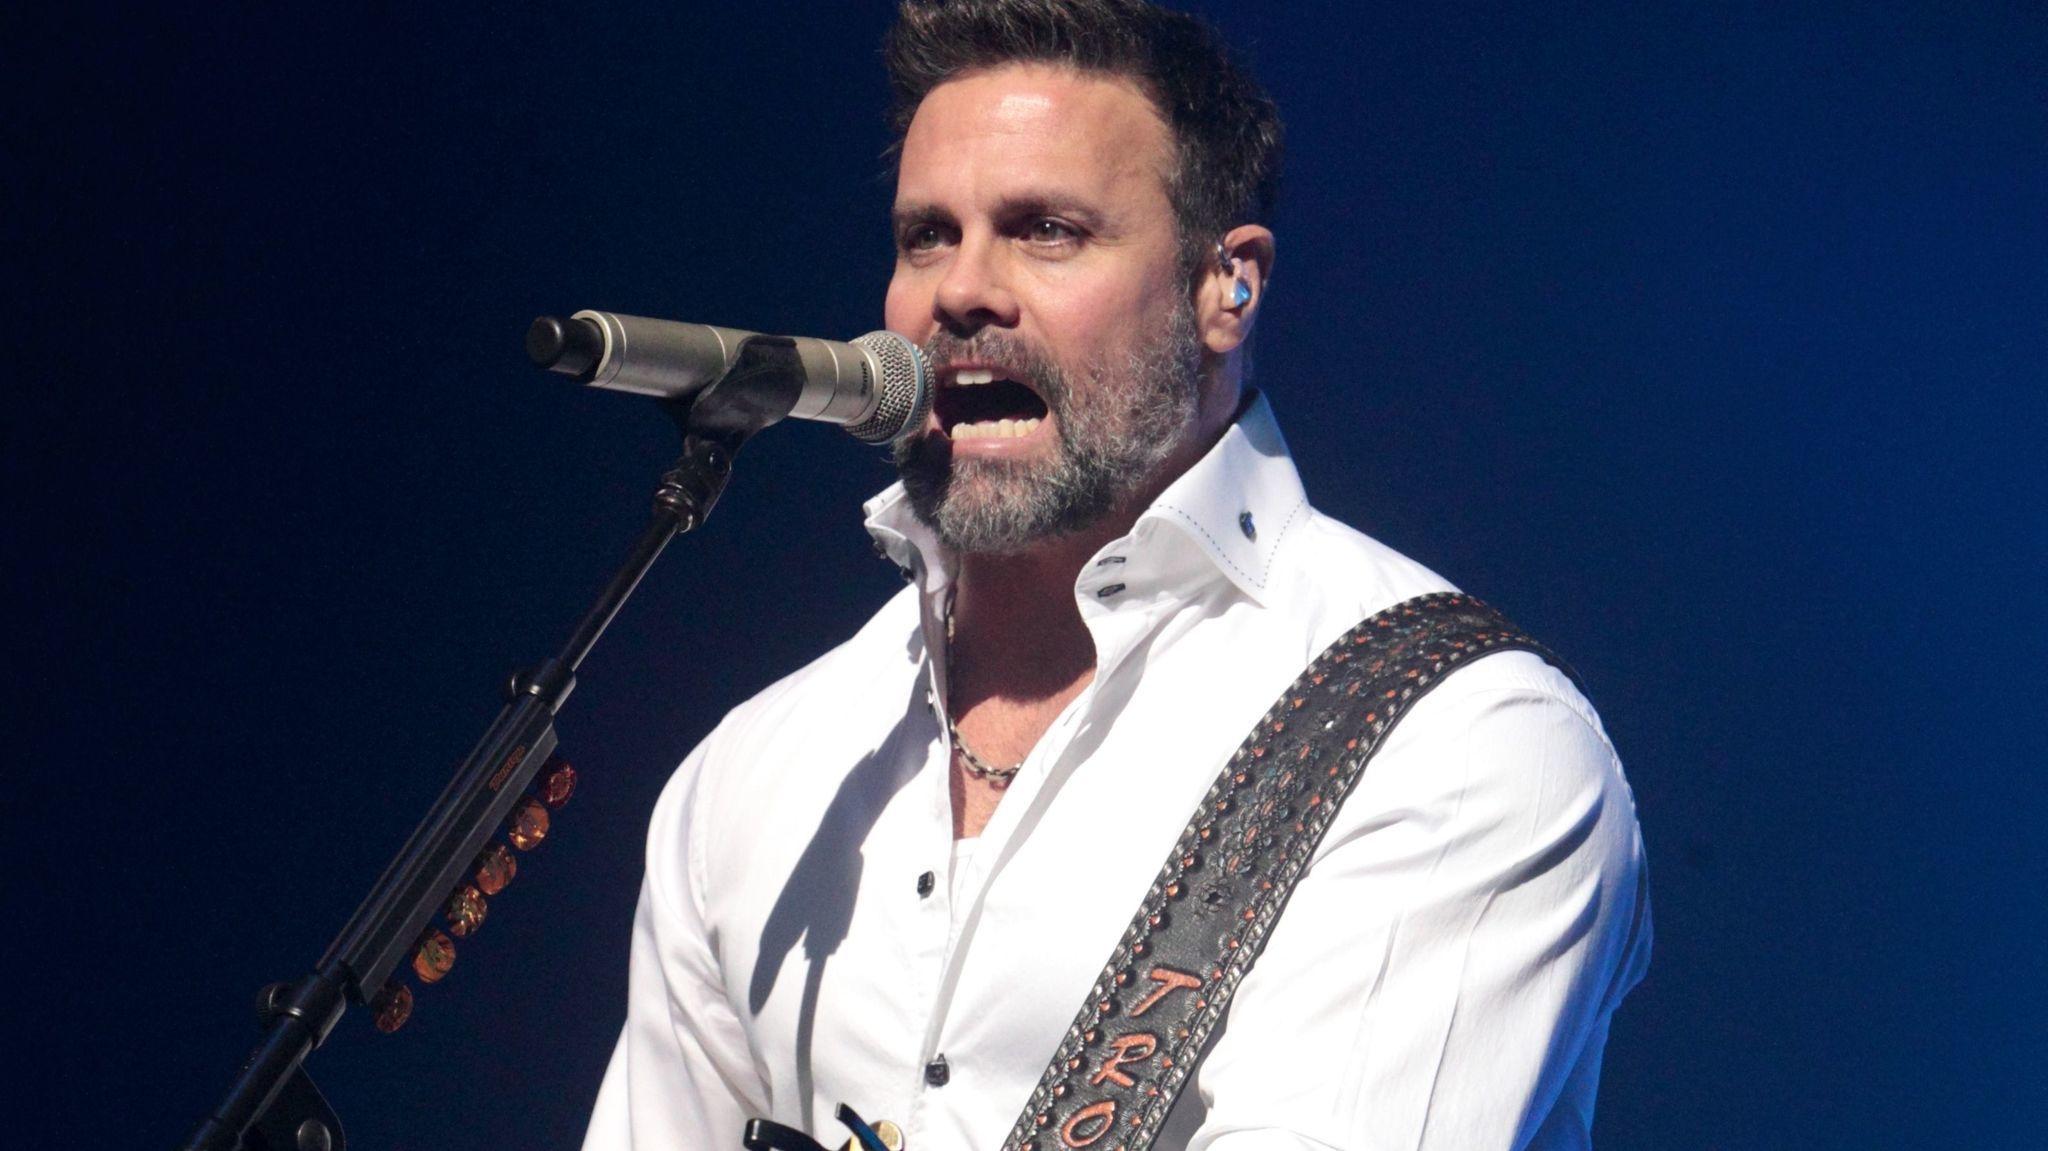 Award Winning Country Music Performer Troy Gentry Dies In